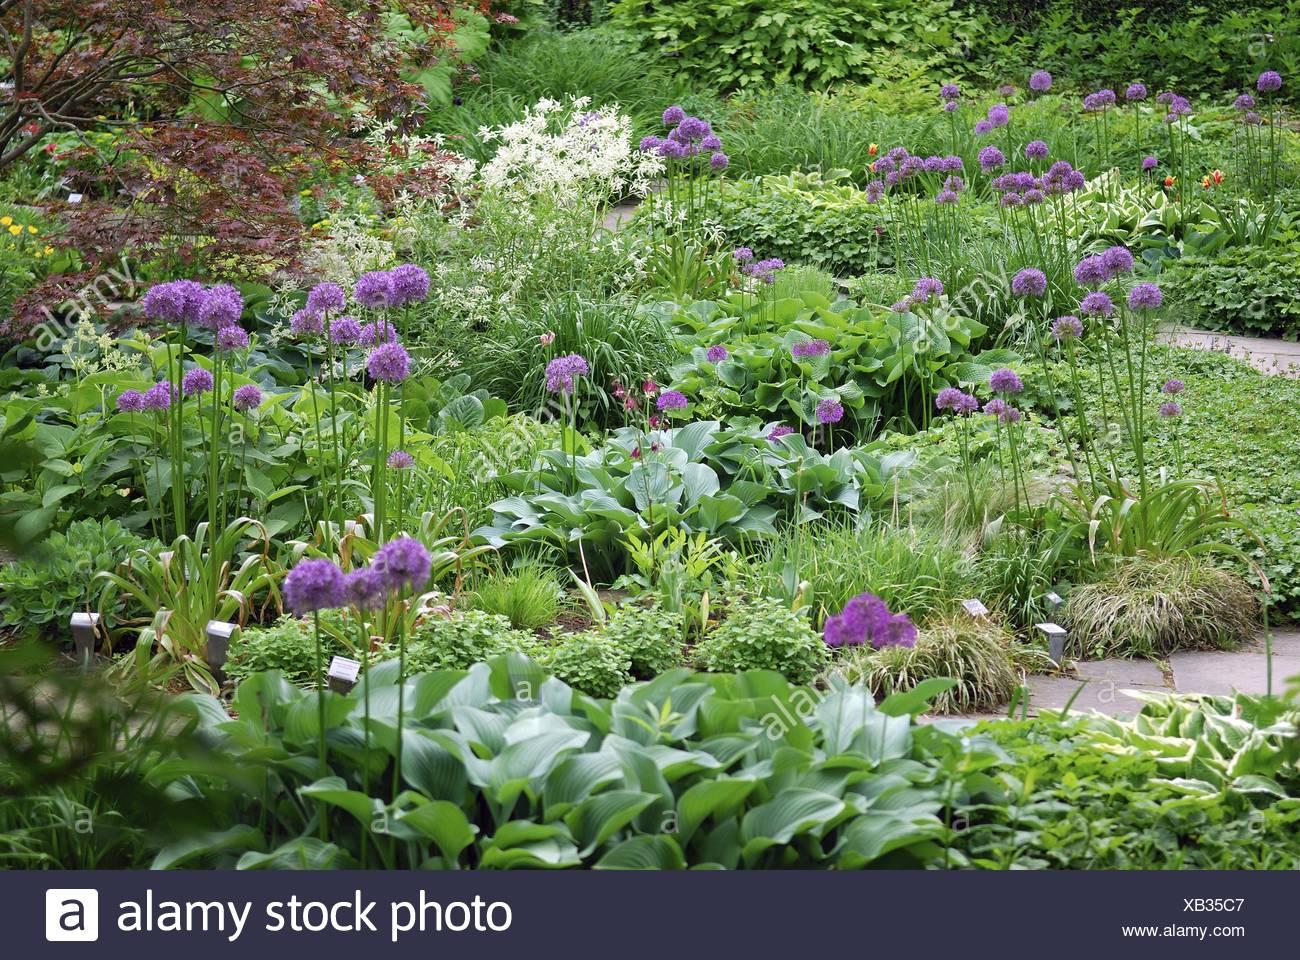 onions (Allium spec.), bloomin onion in a garden - Stock Image